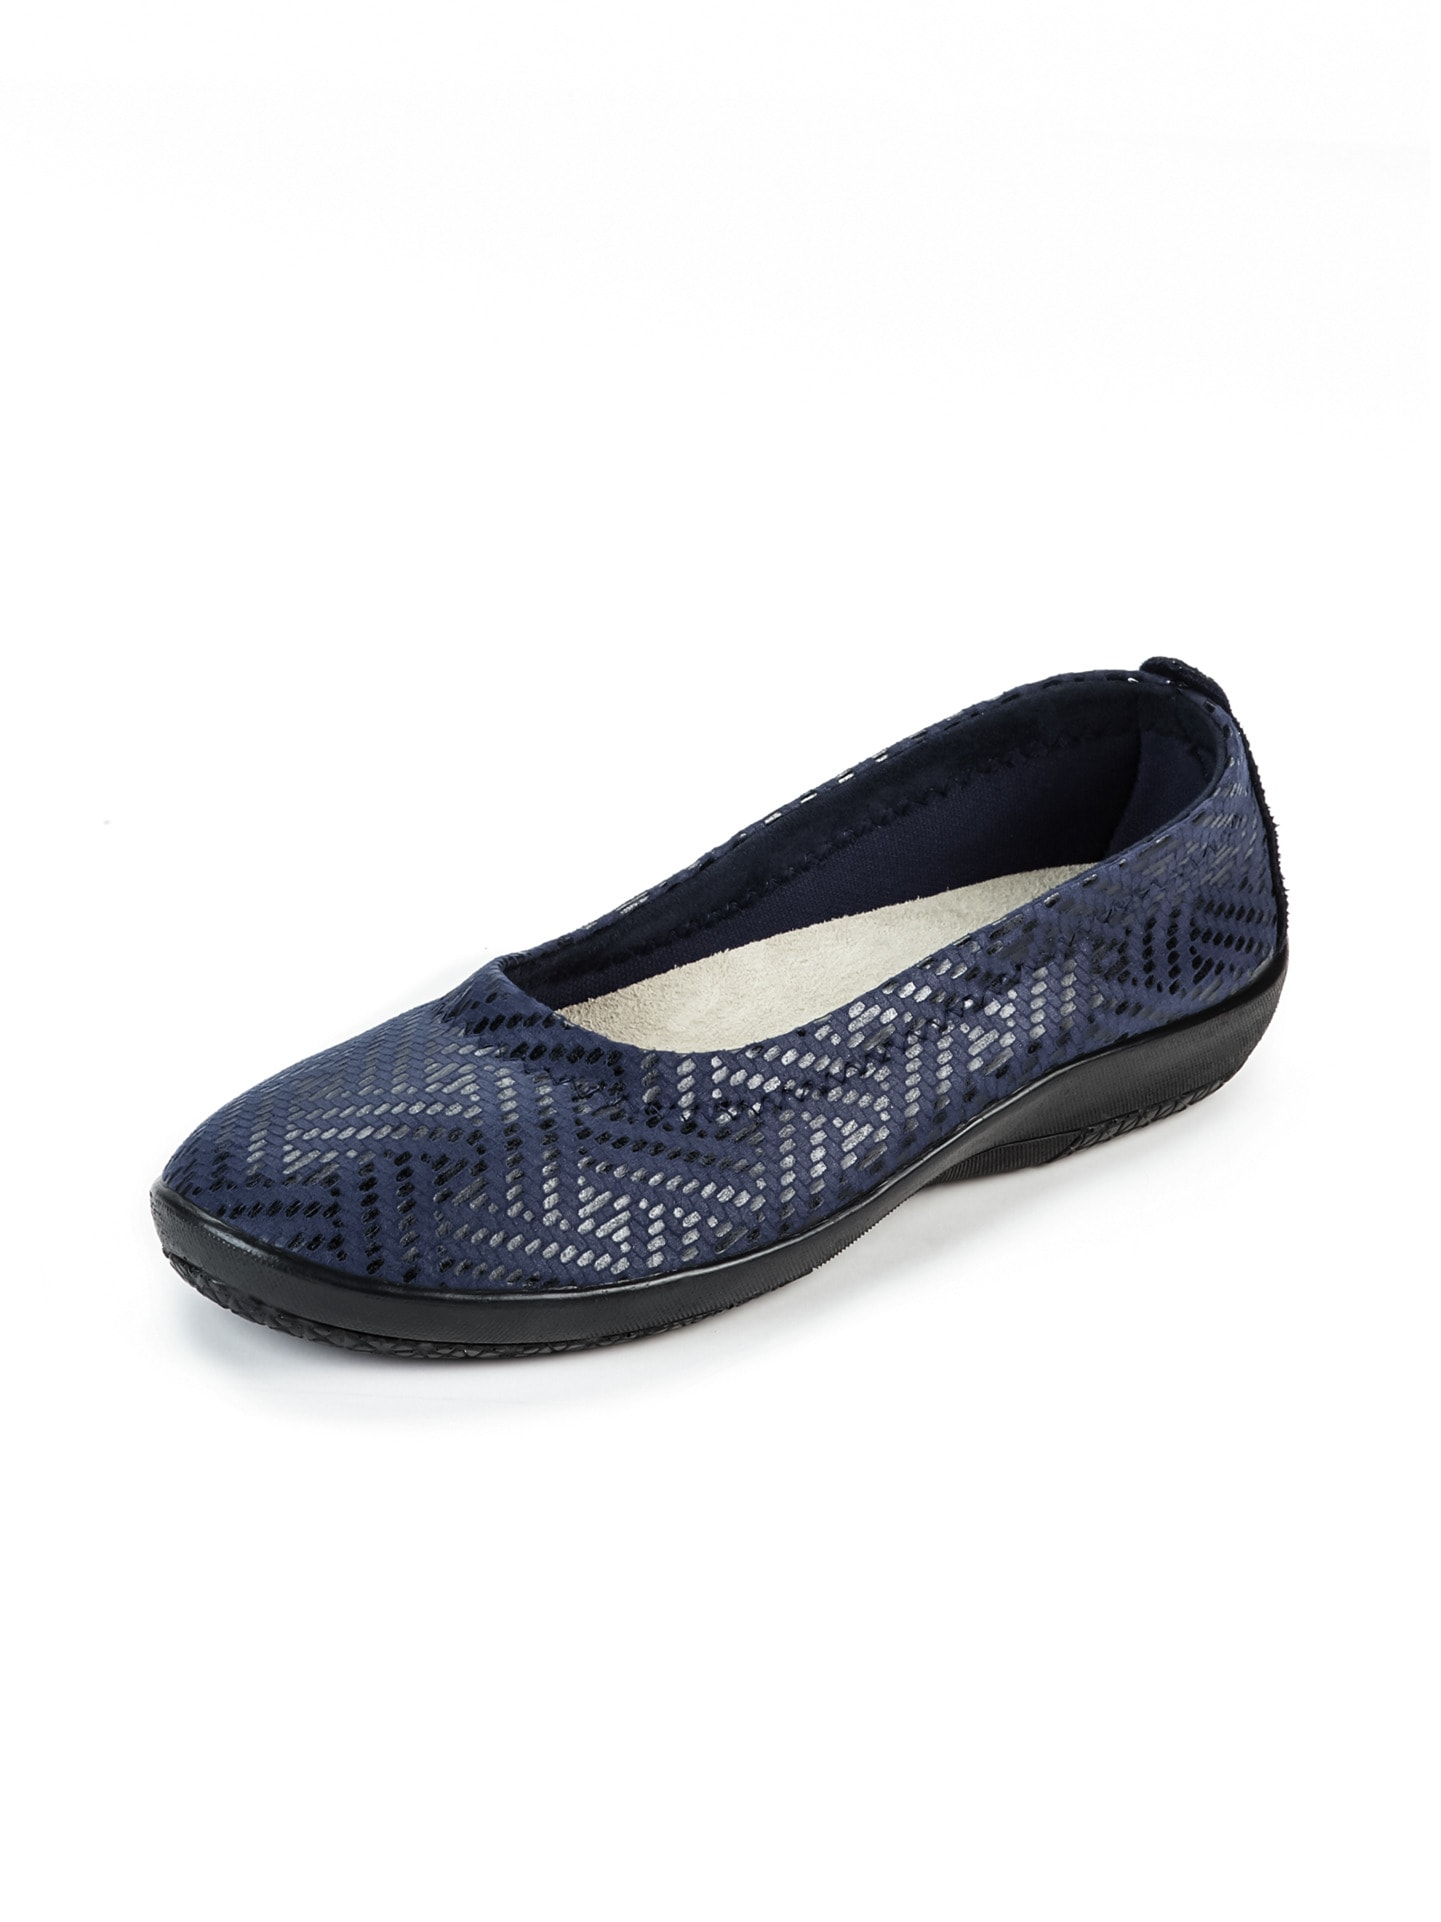 Avena Damen Hallux-Soft-Slipper Flechtmuster Blau 45-6859-1